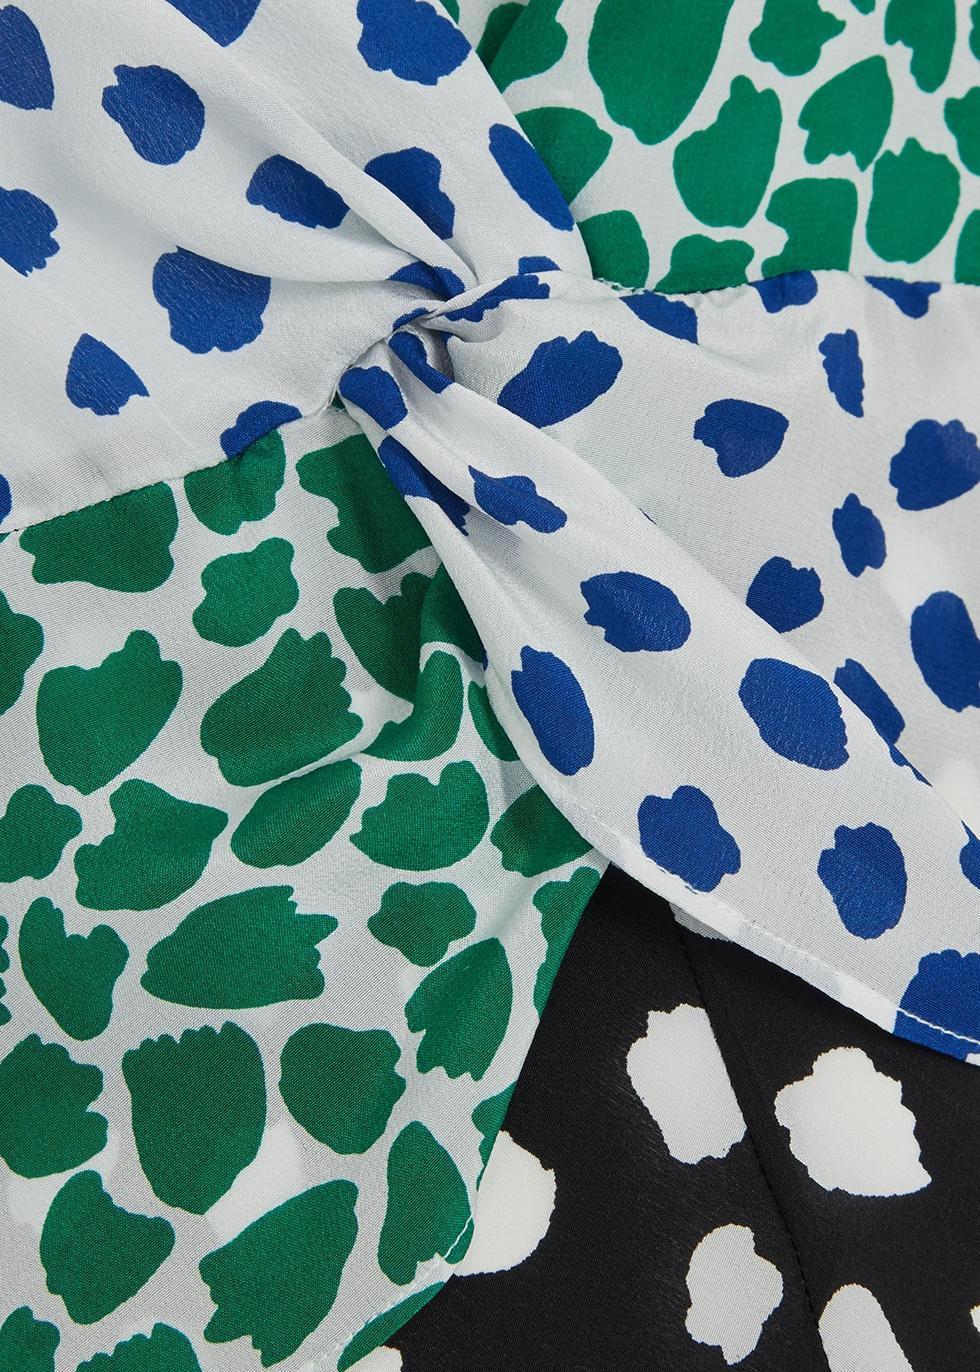 Chelsea printed silk midi dress - RIXO